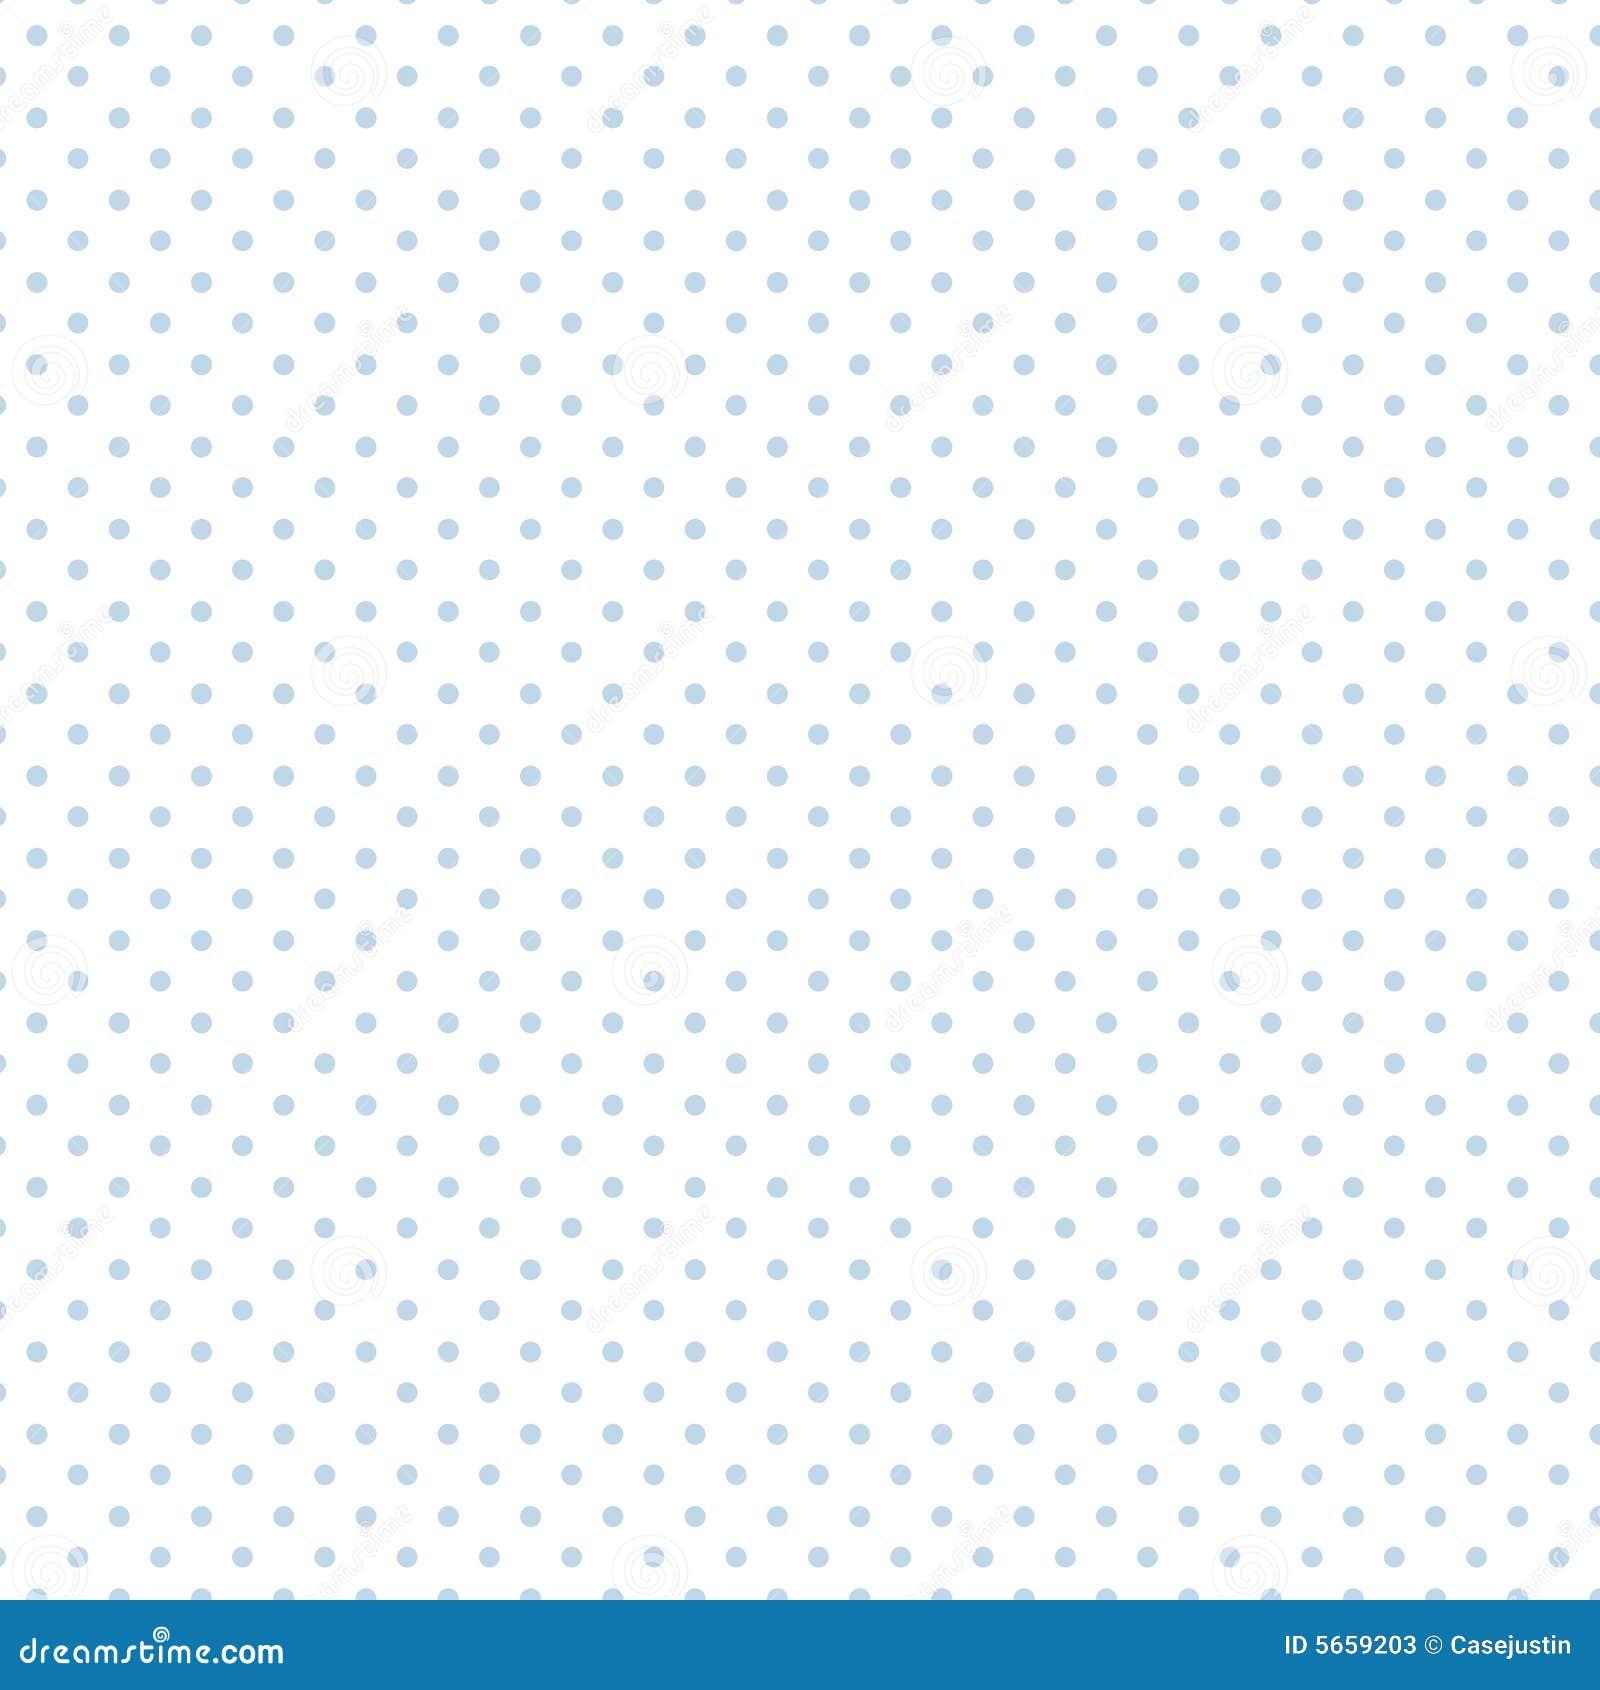 Small Pastel Blue Polka Dots On White, Seamless Stock ...